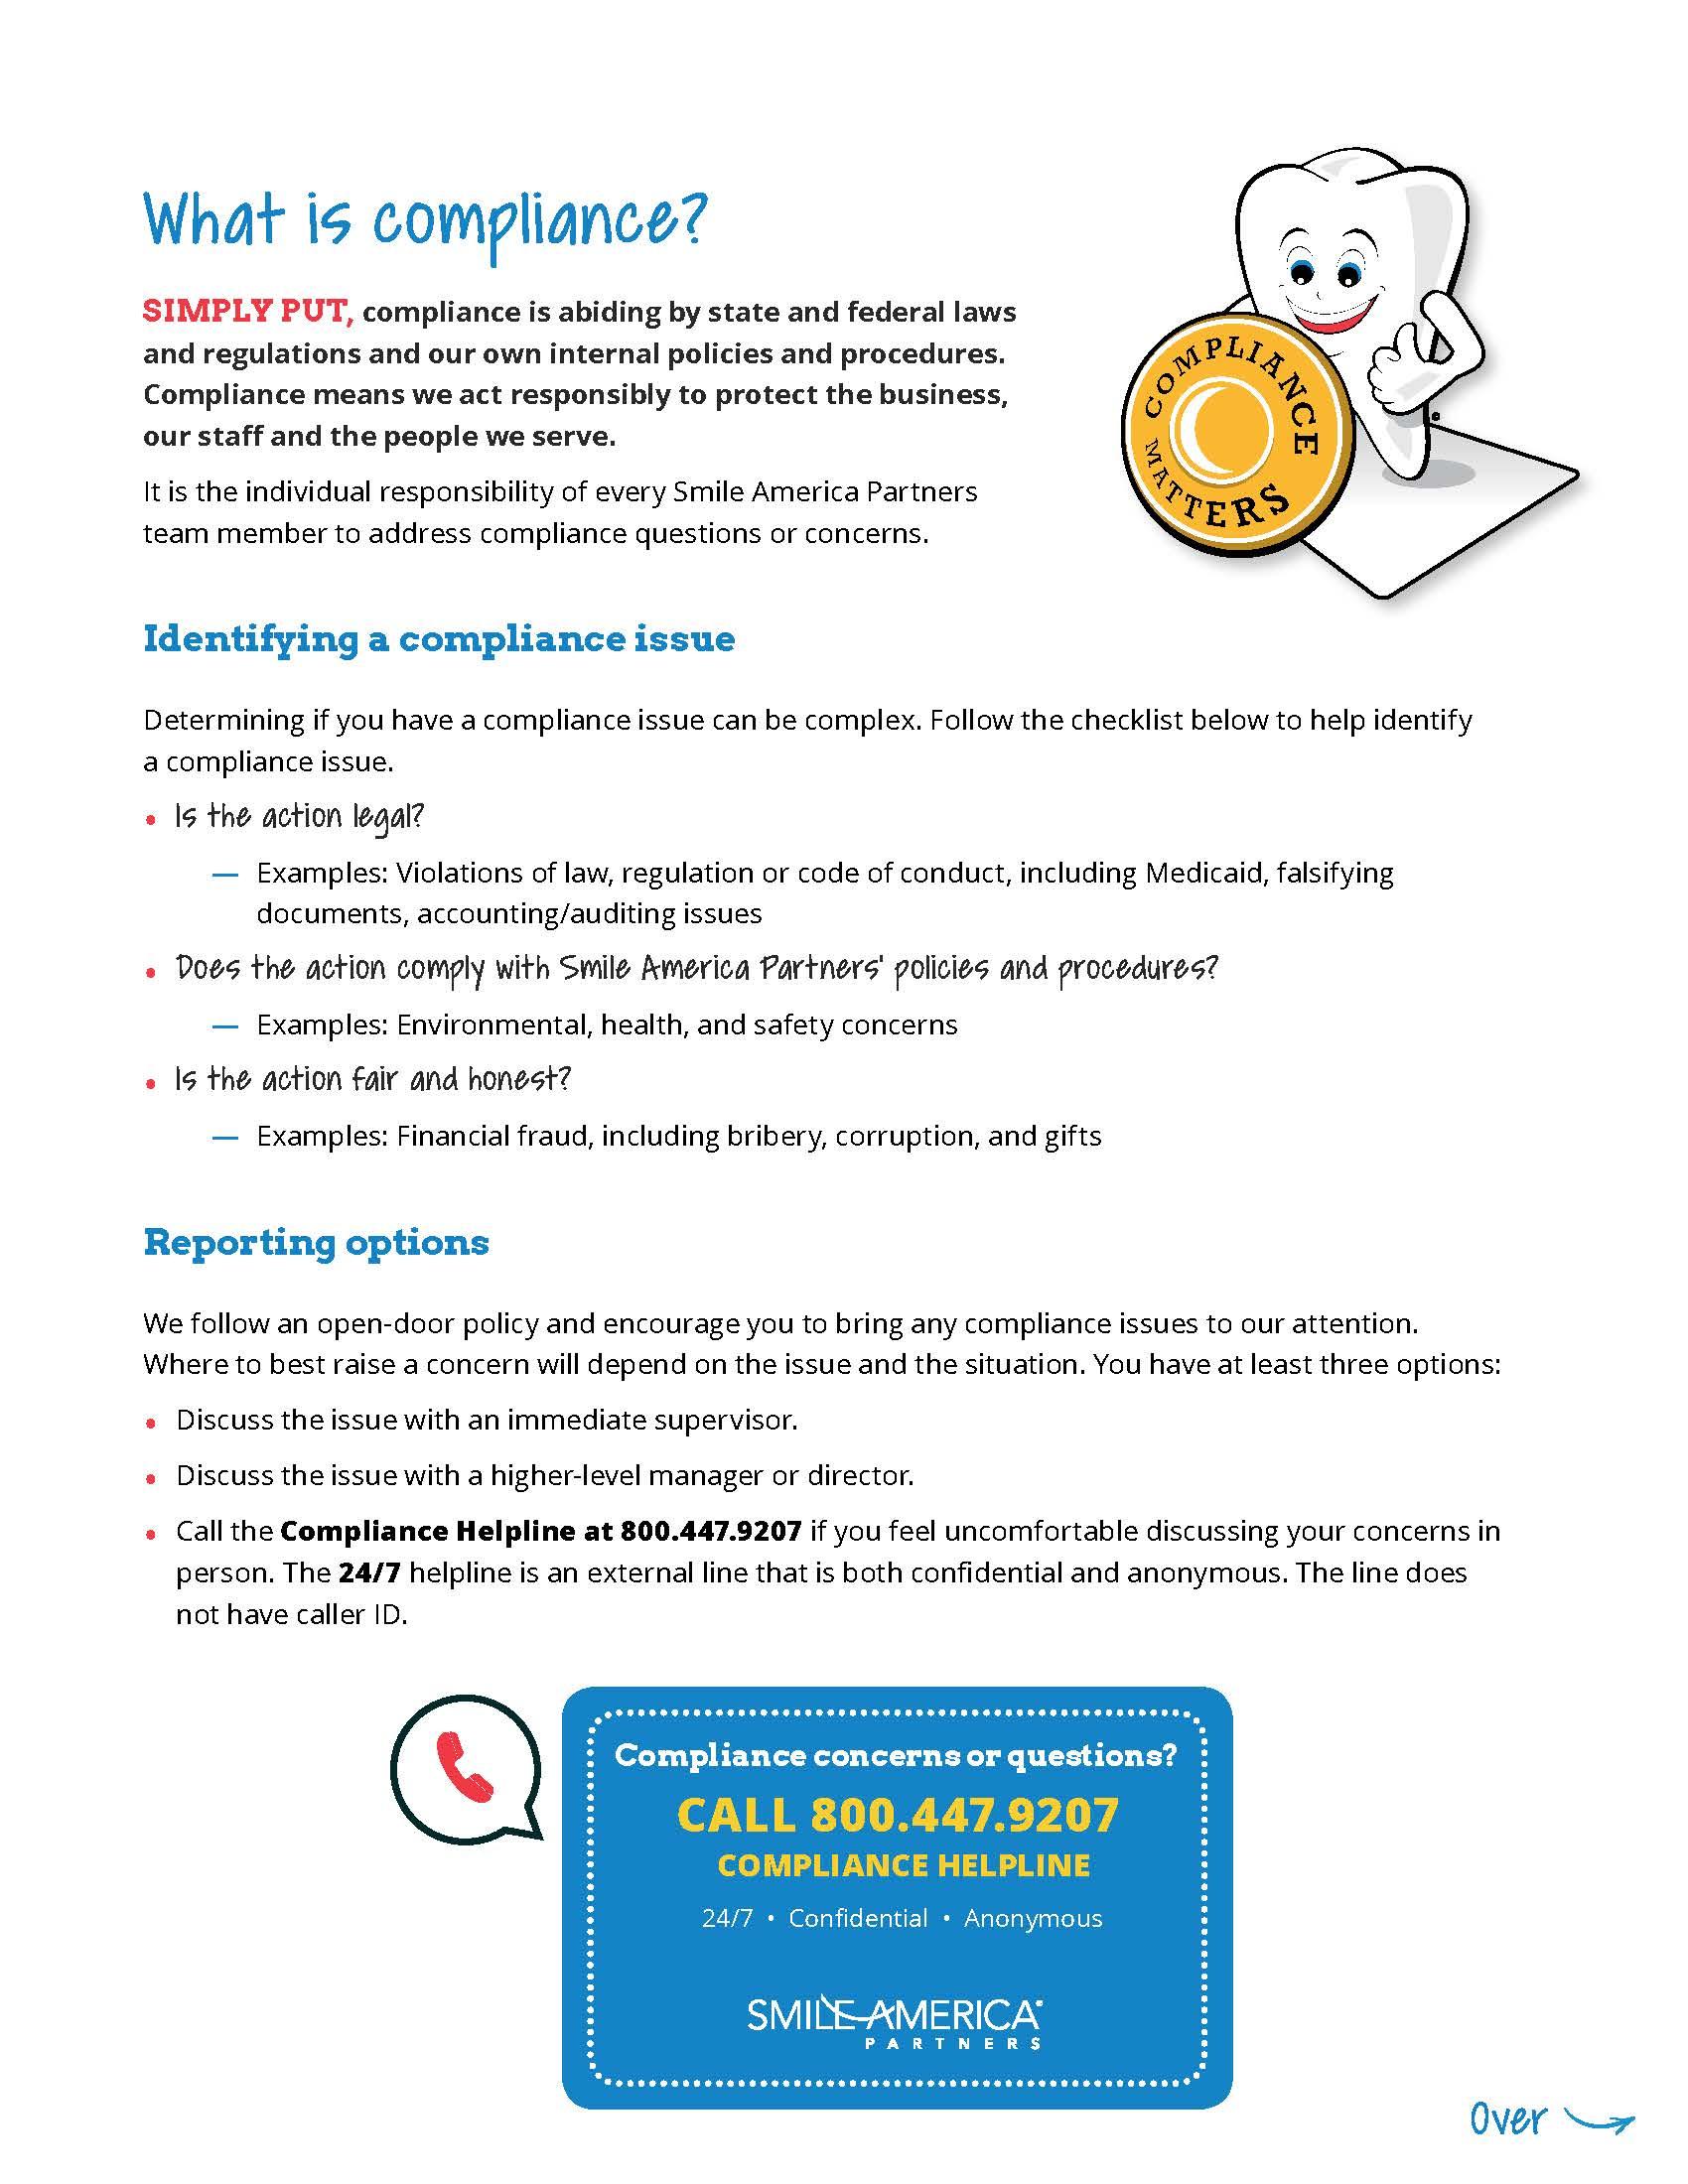 EdgePublicom-SAP-1-Compliance_Page_1.jpg